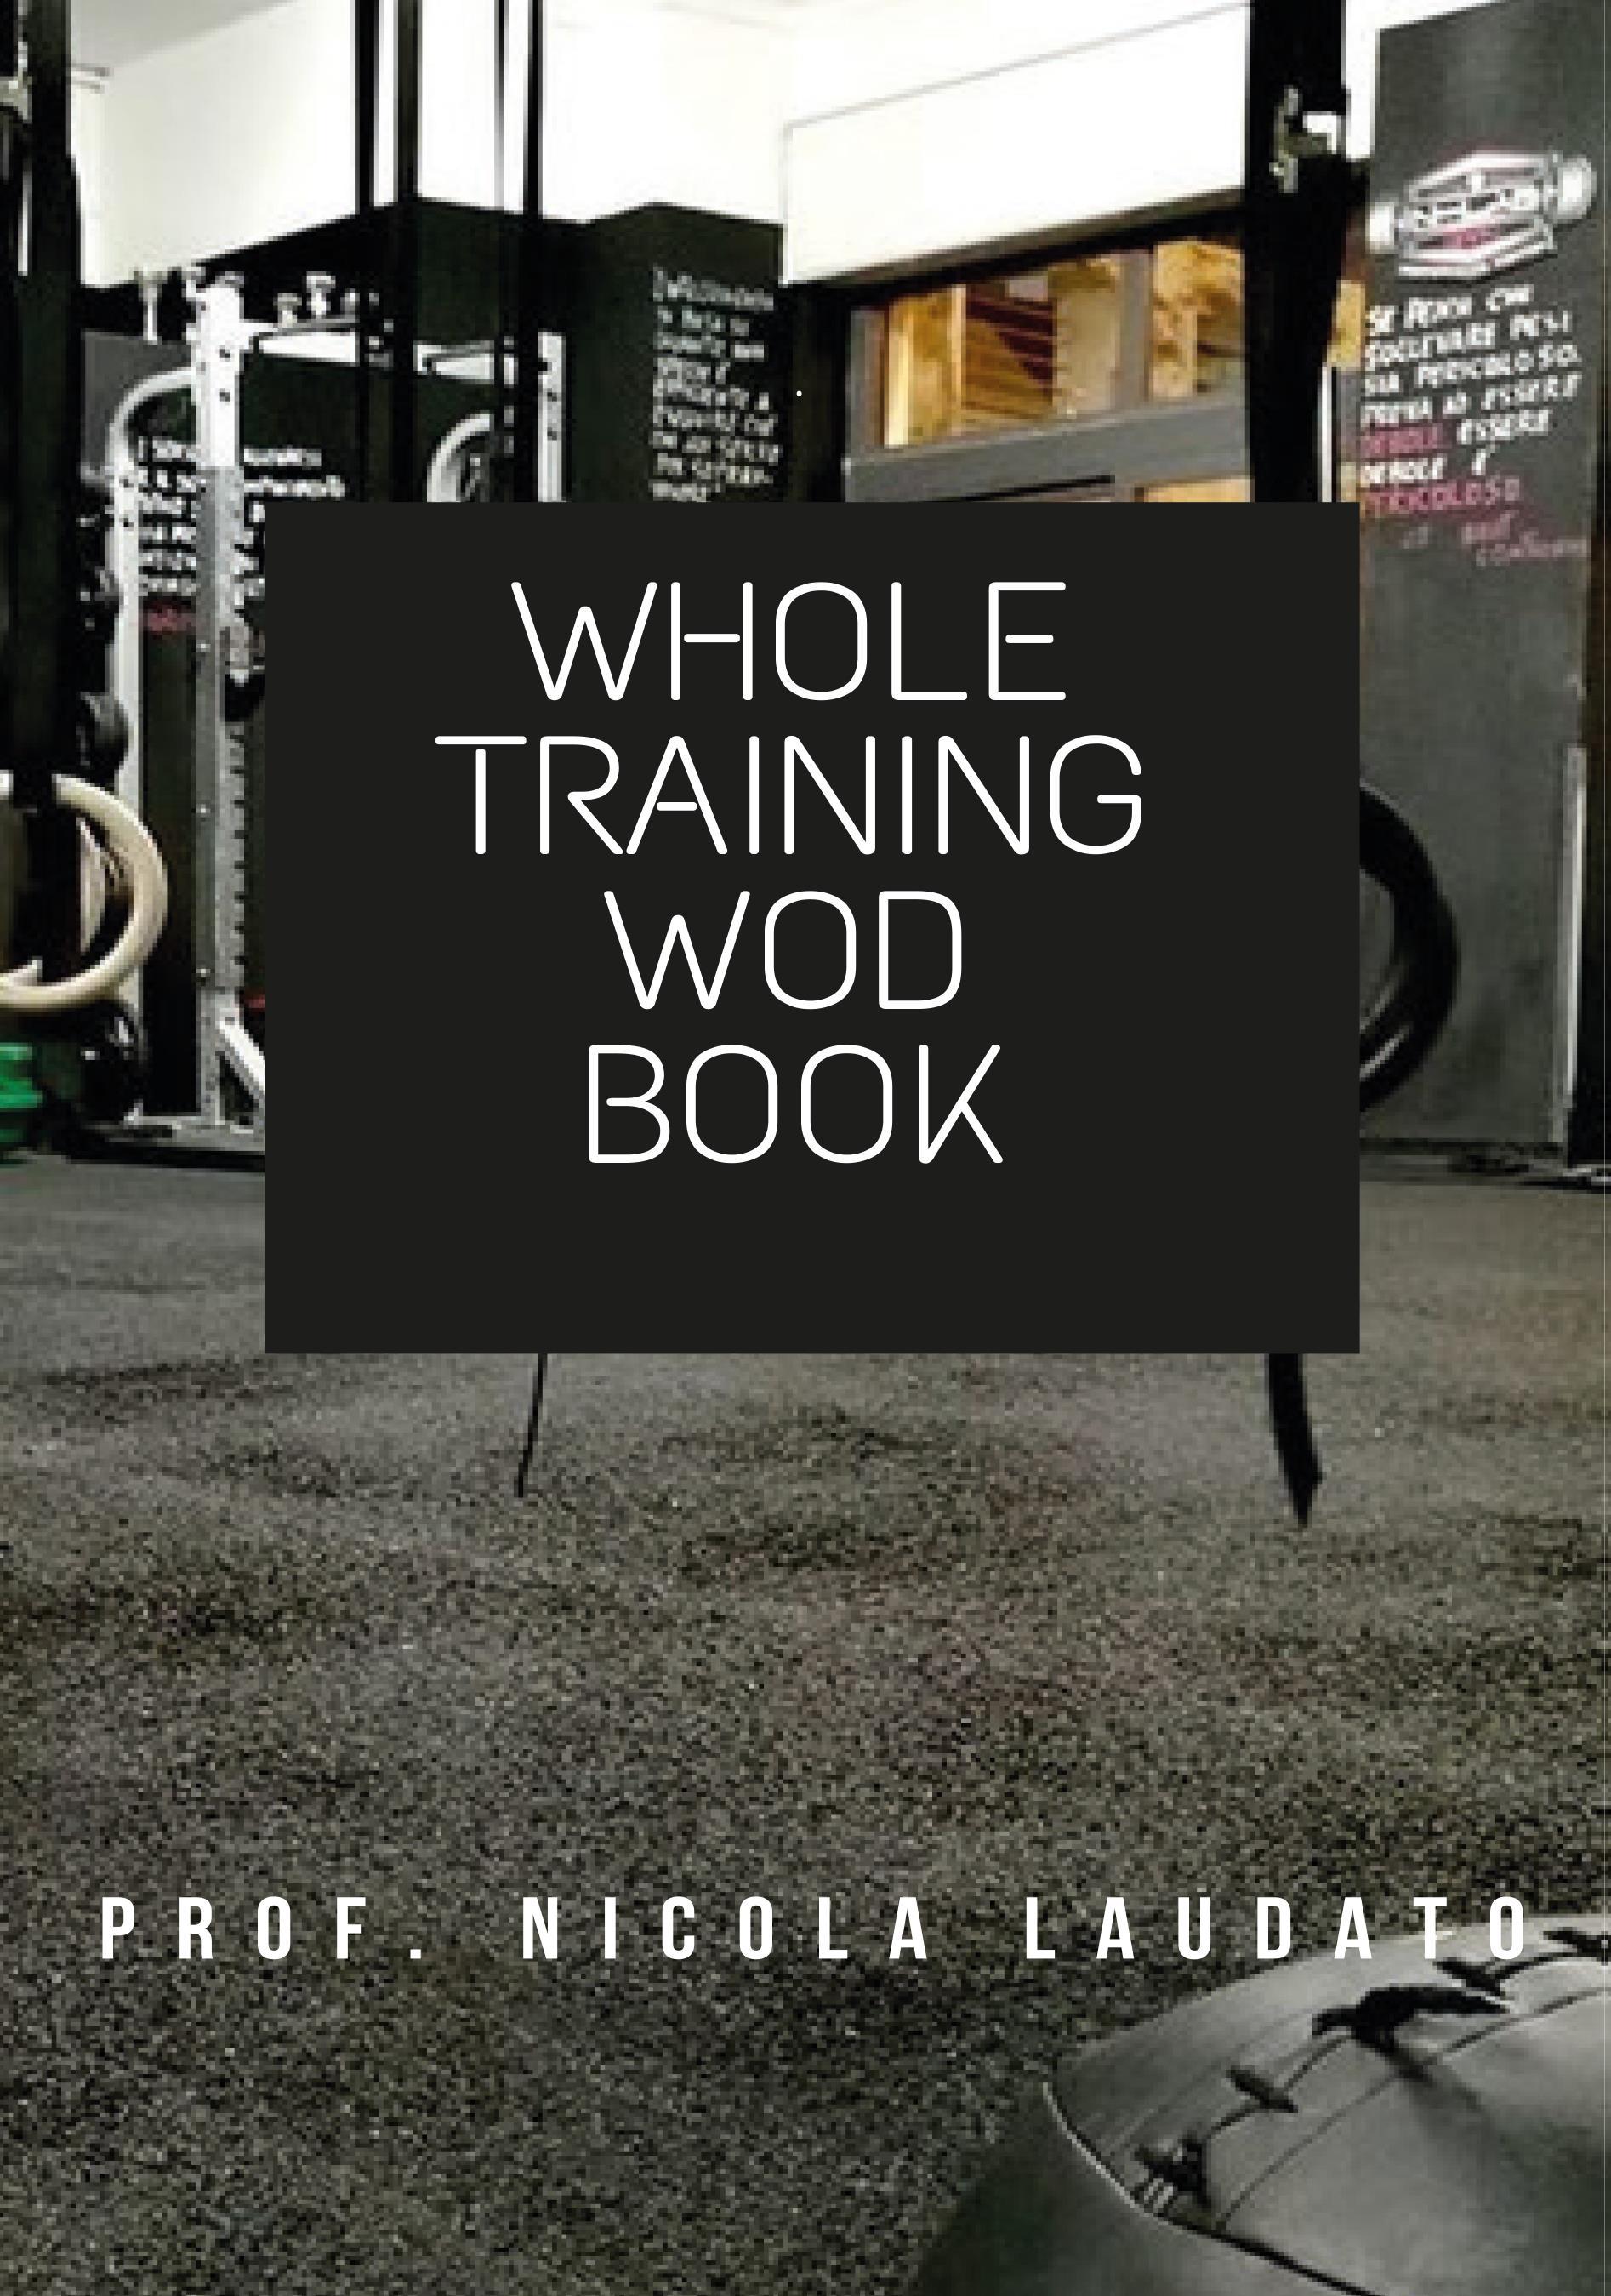 Whole Training WOD Book